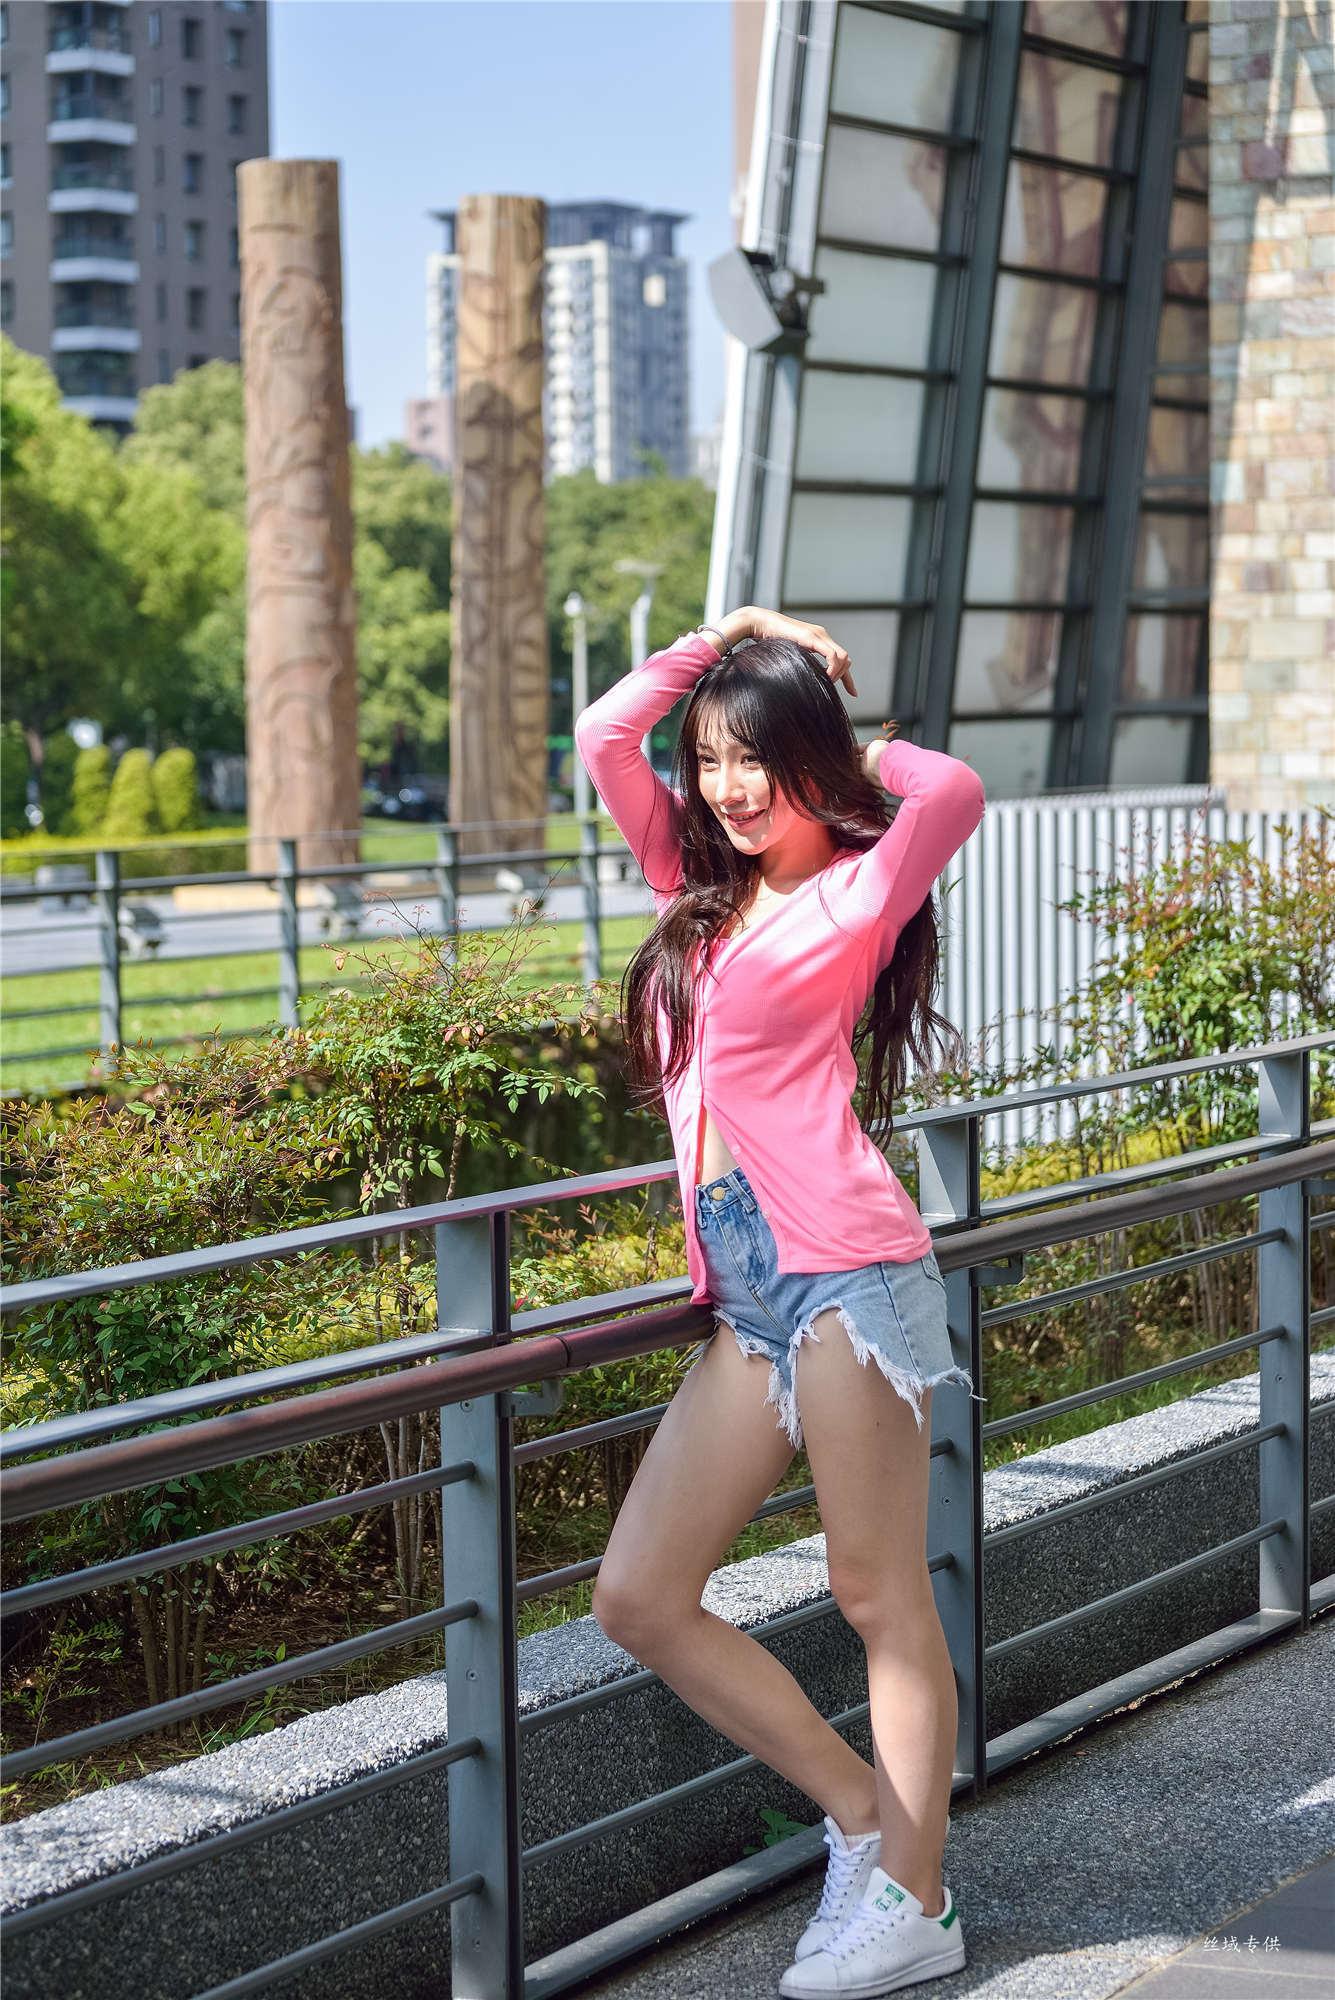 VOL.39 [台湾正妹]牛仔街拍阳光:比比儿(Katie Chiu)超高清个人性感漂亮大图(147P)